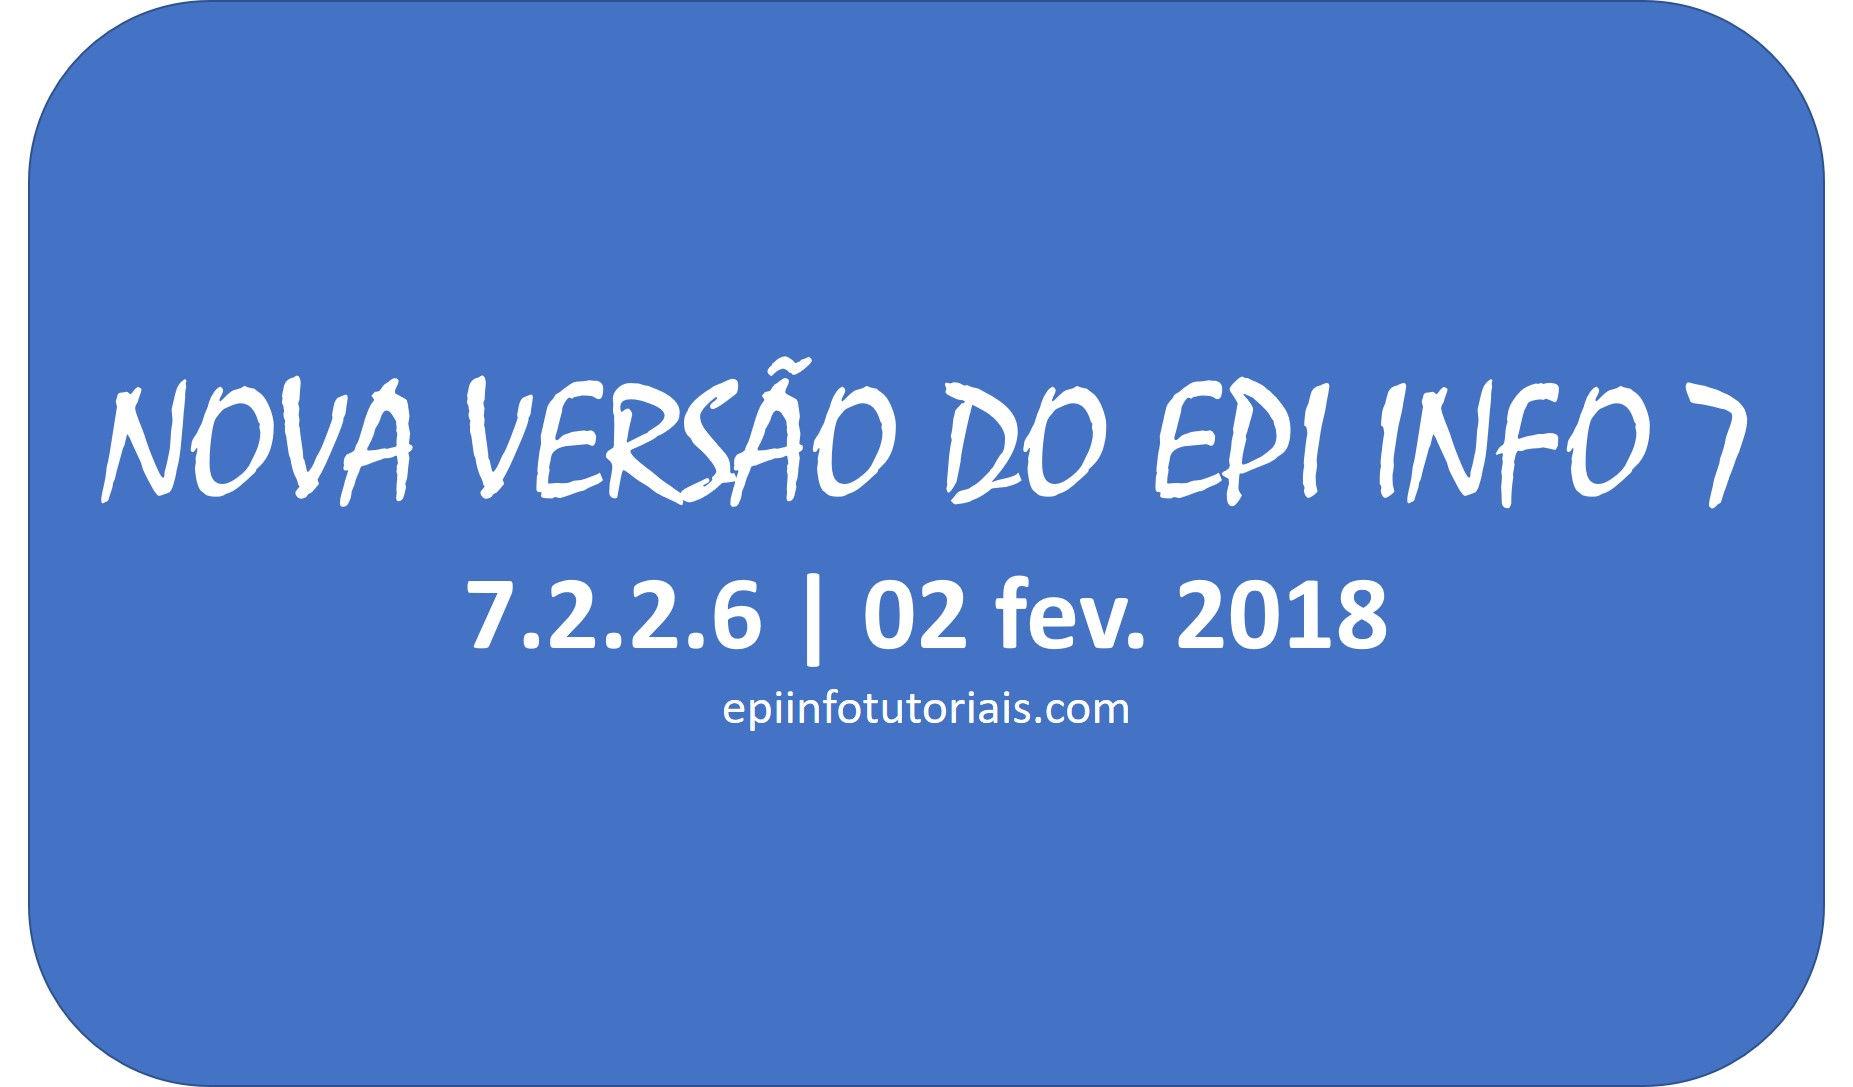 epi info 7.2.2.6